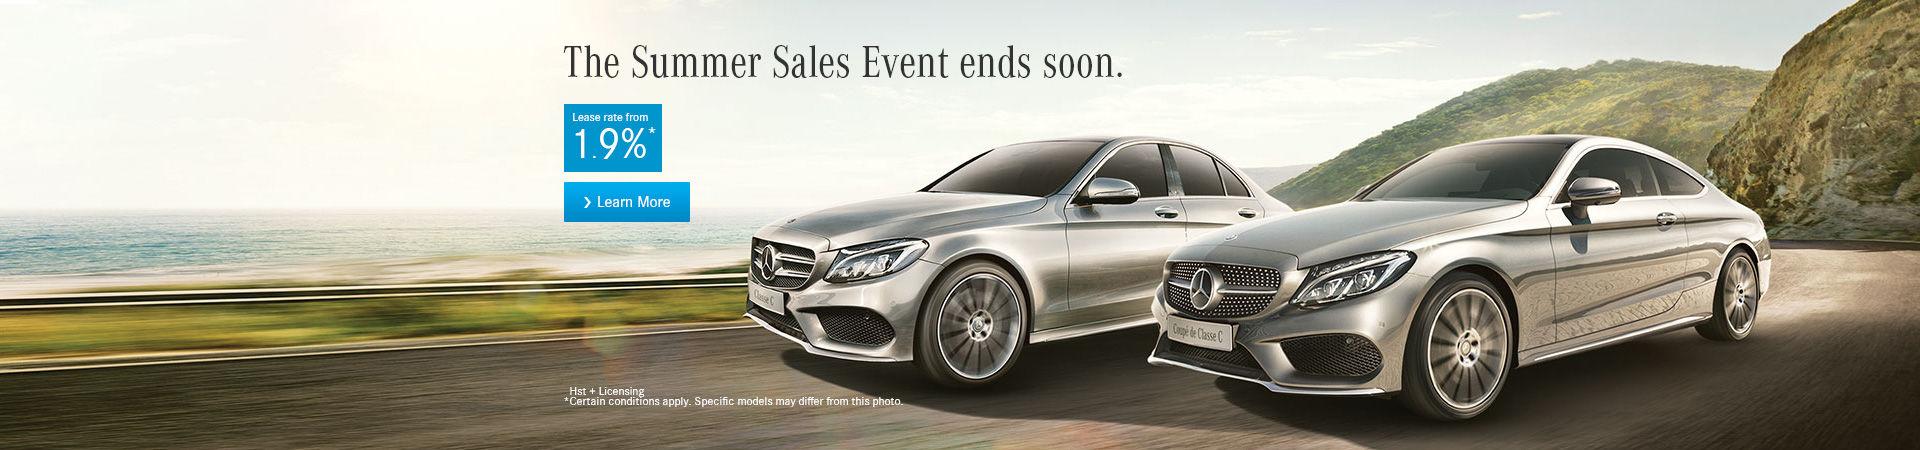 Mercedes Summer Sales Event - HEADER